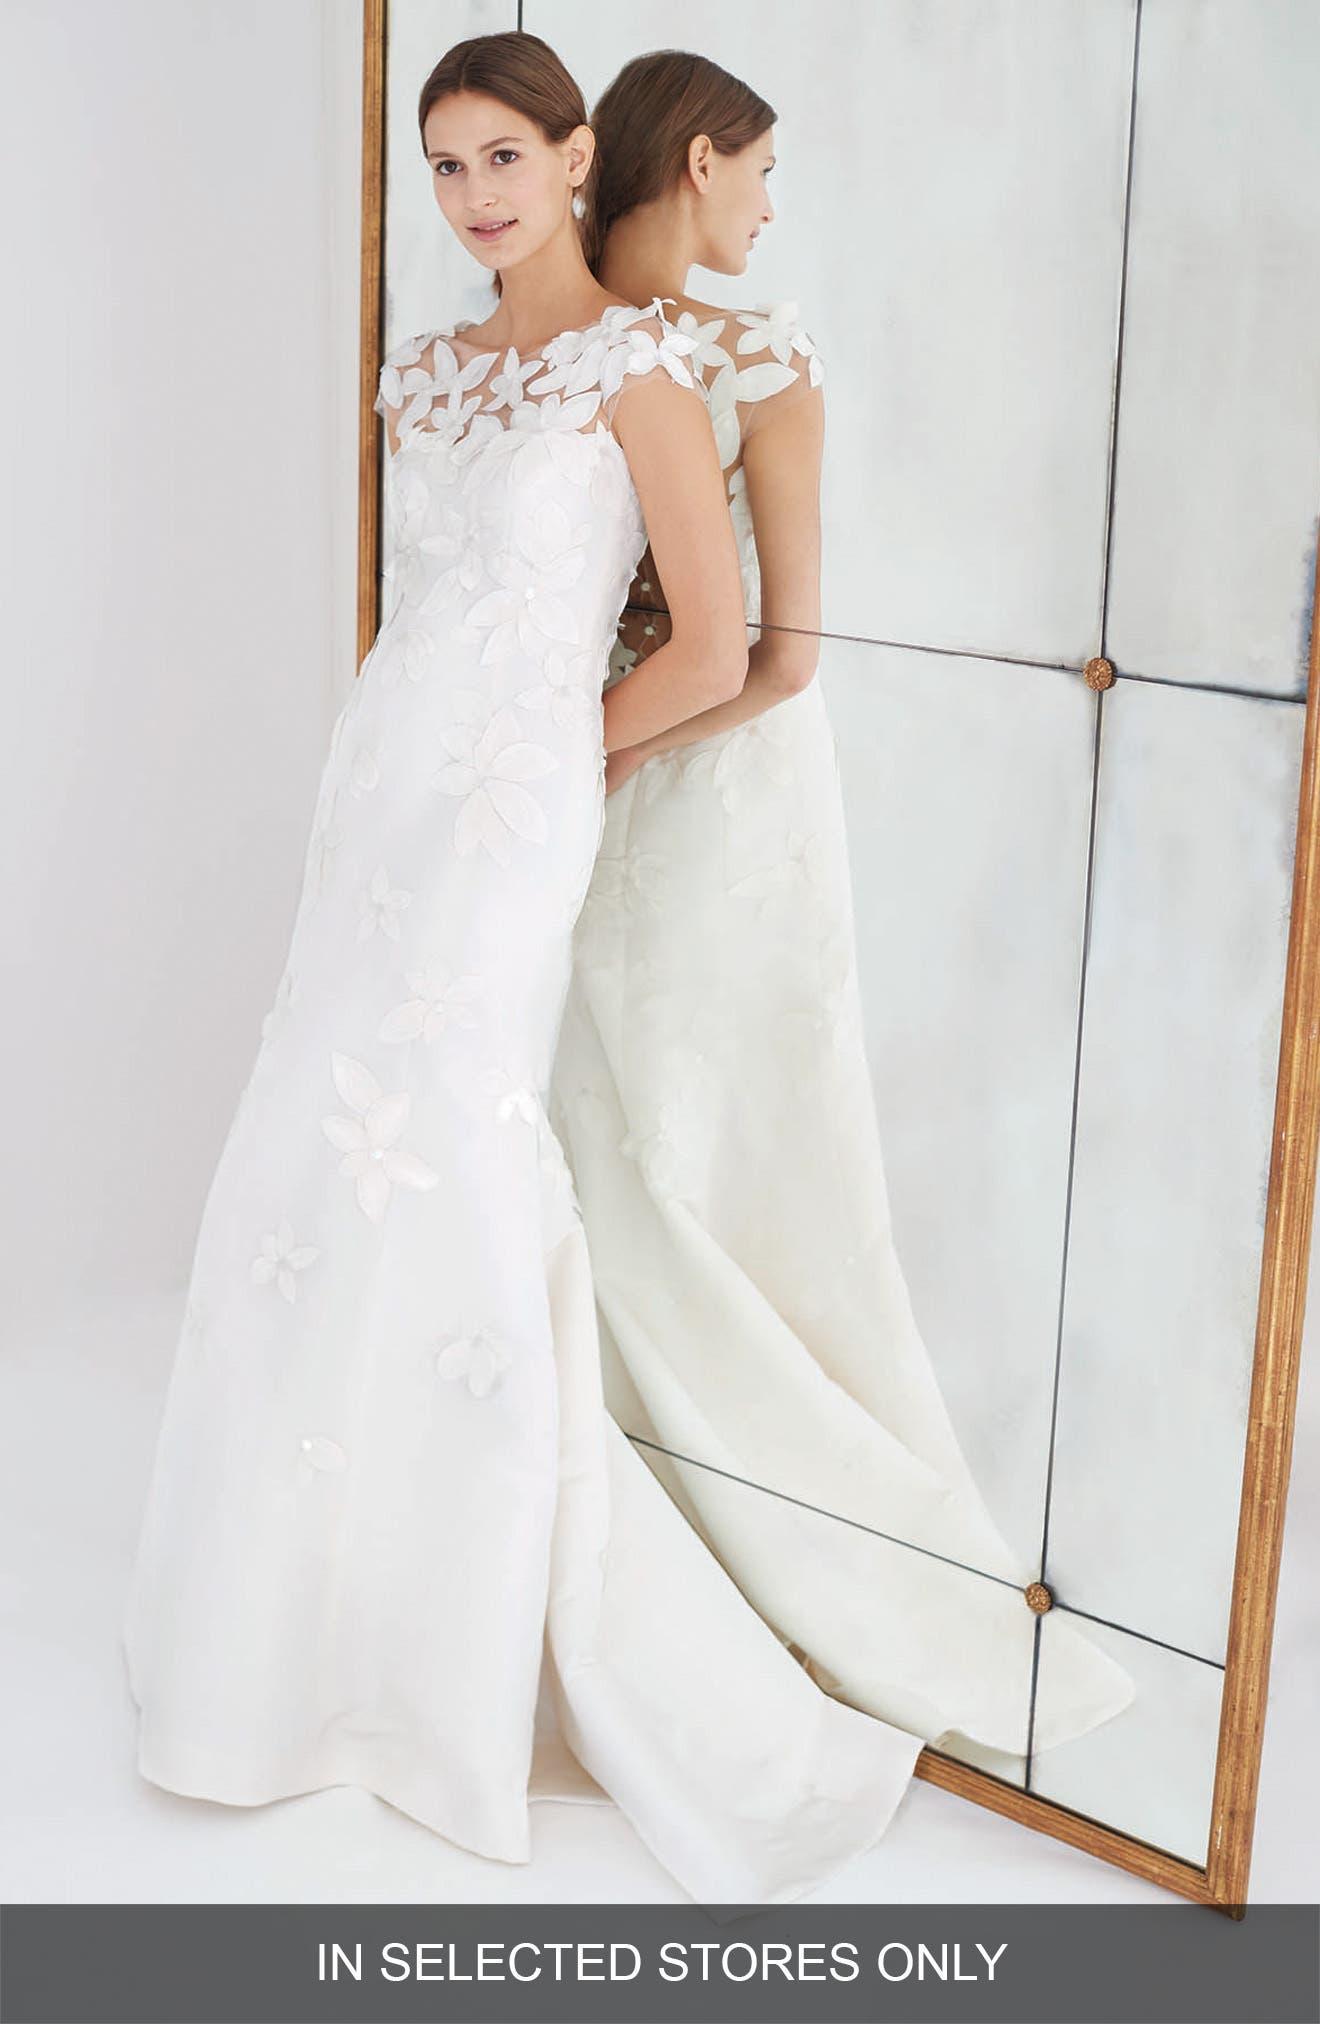 Main Image - Carolina Herrera Gretchen Embroidered Faille Trumpet Gown